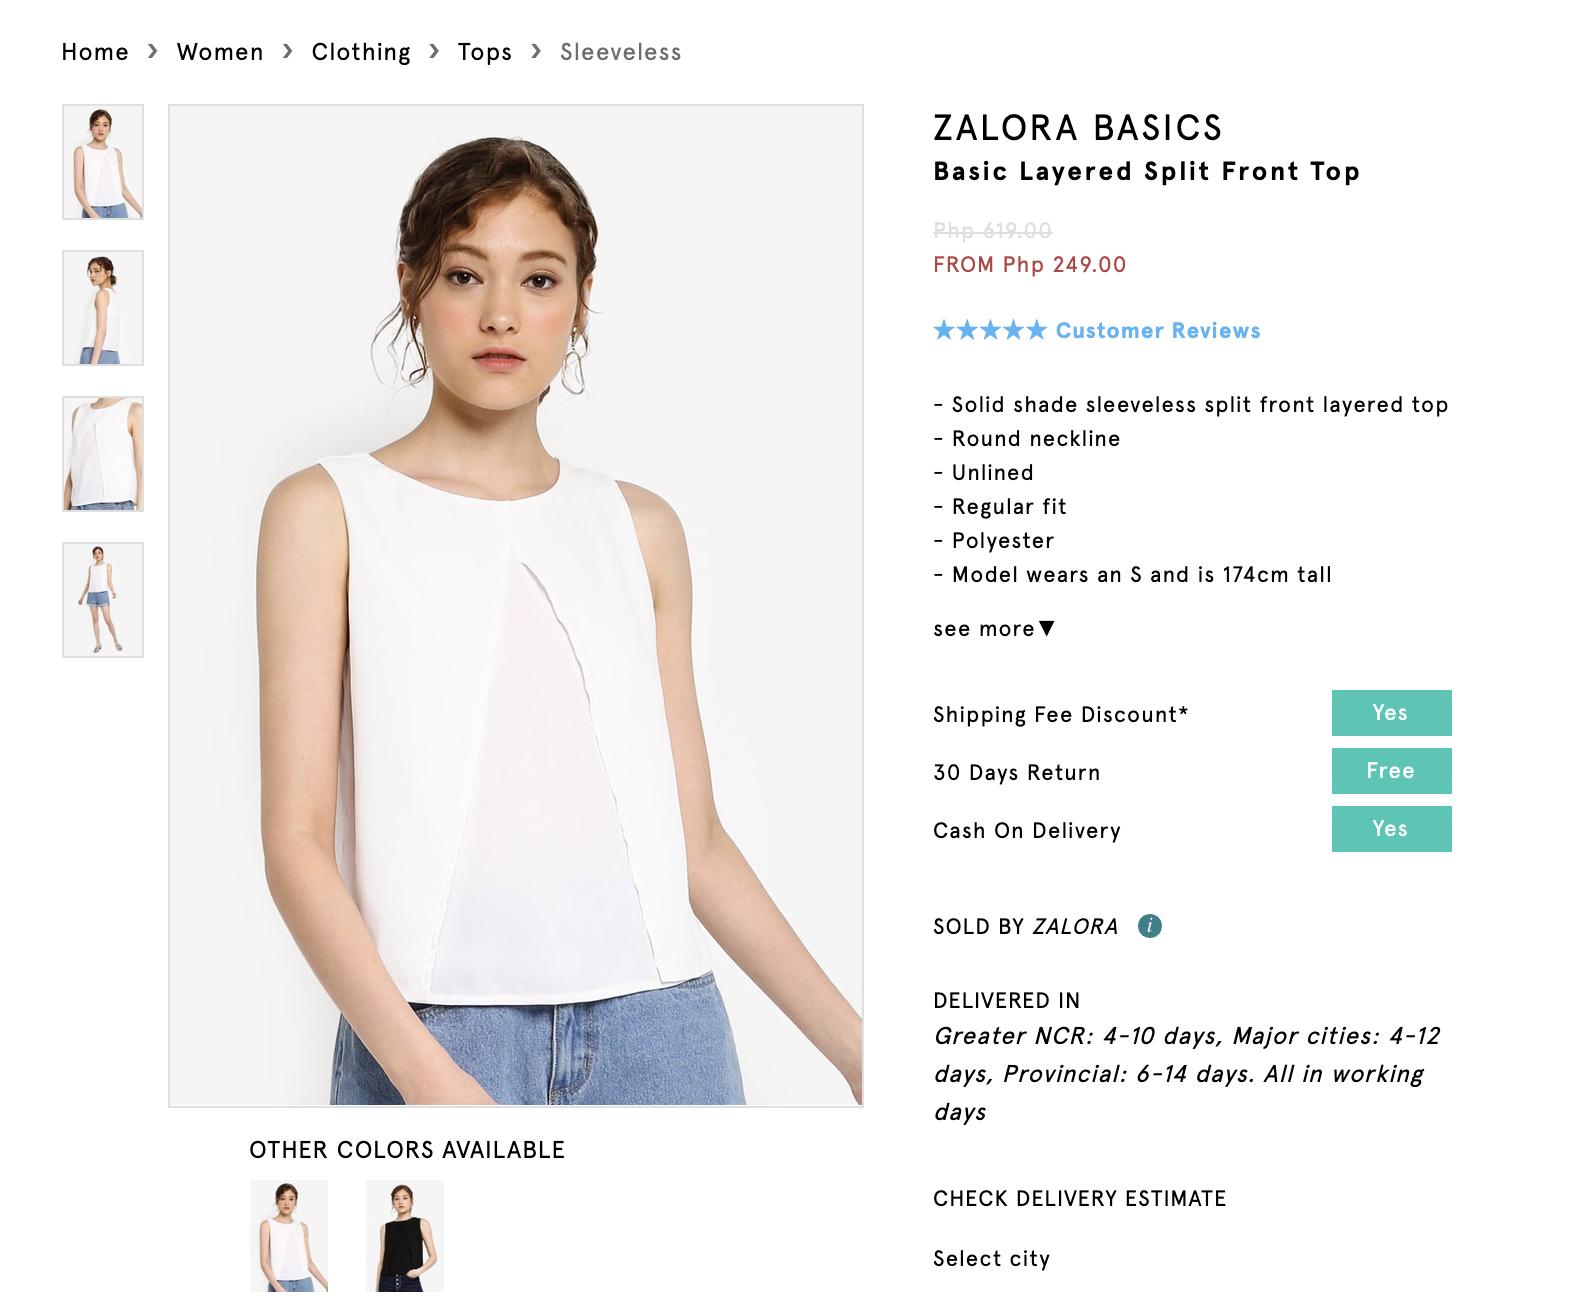 Screenshot of Zalora Basics Basic Layered Split Top